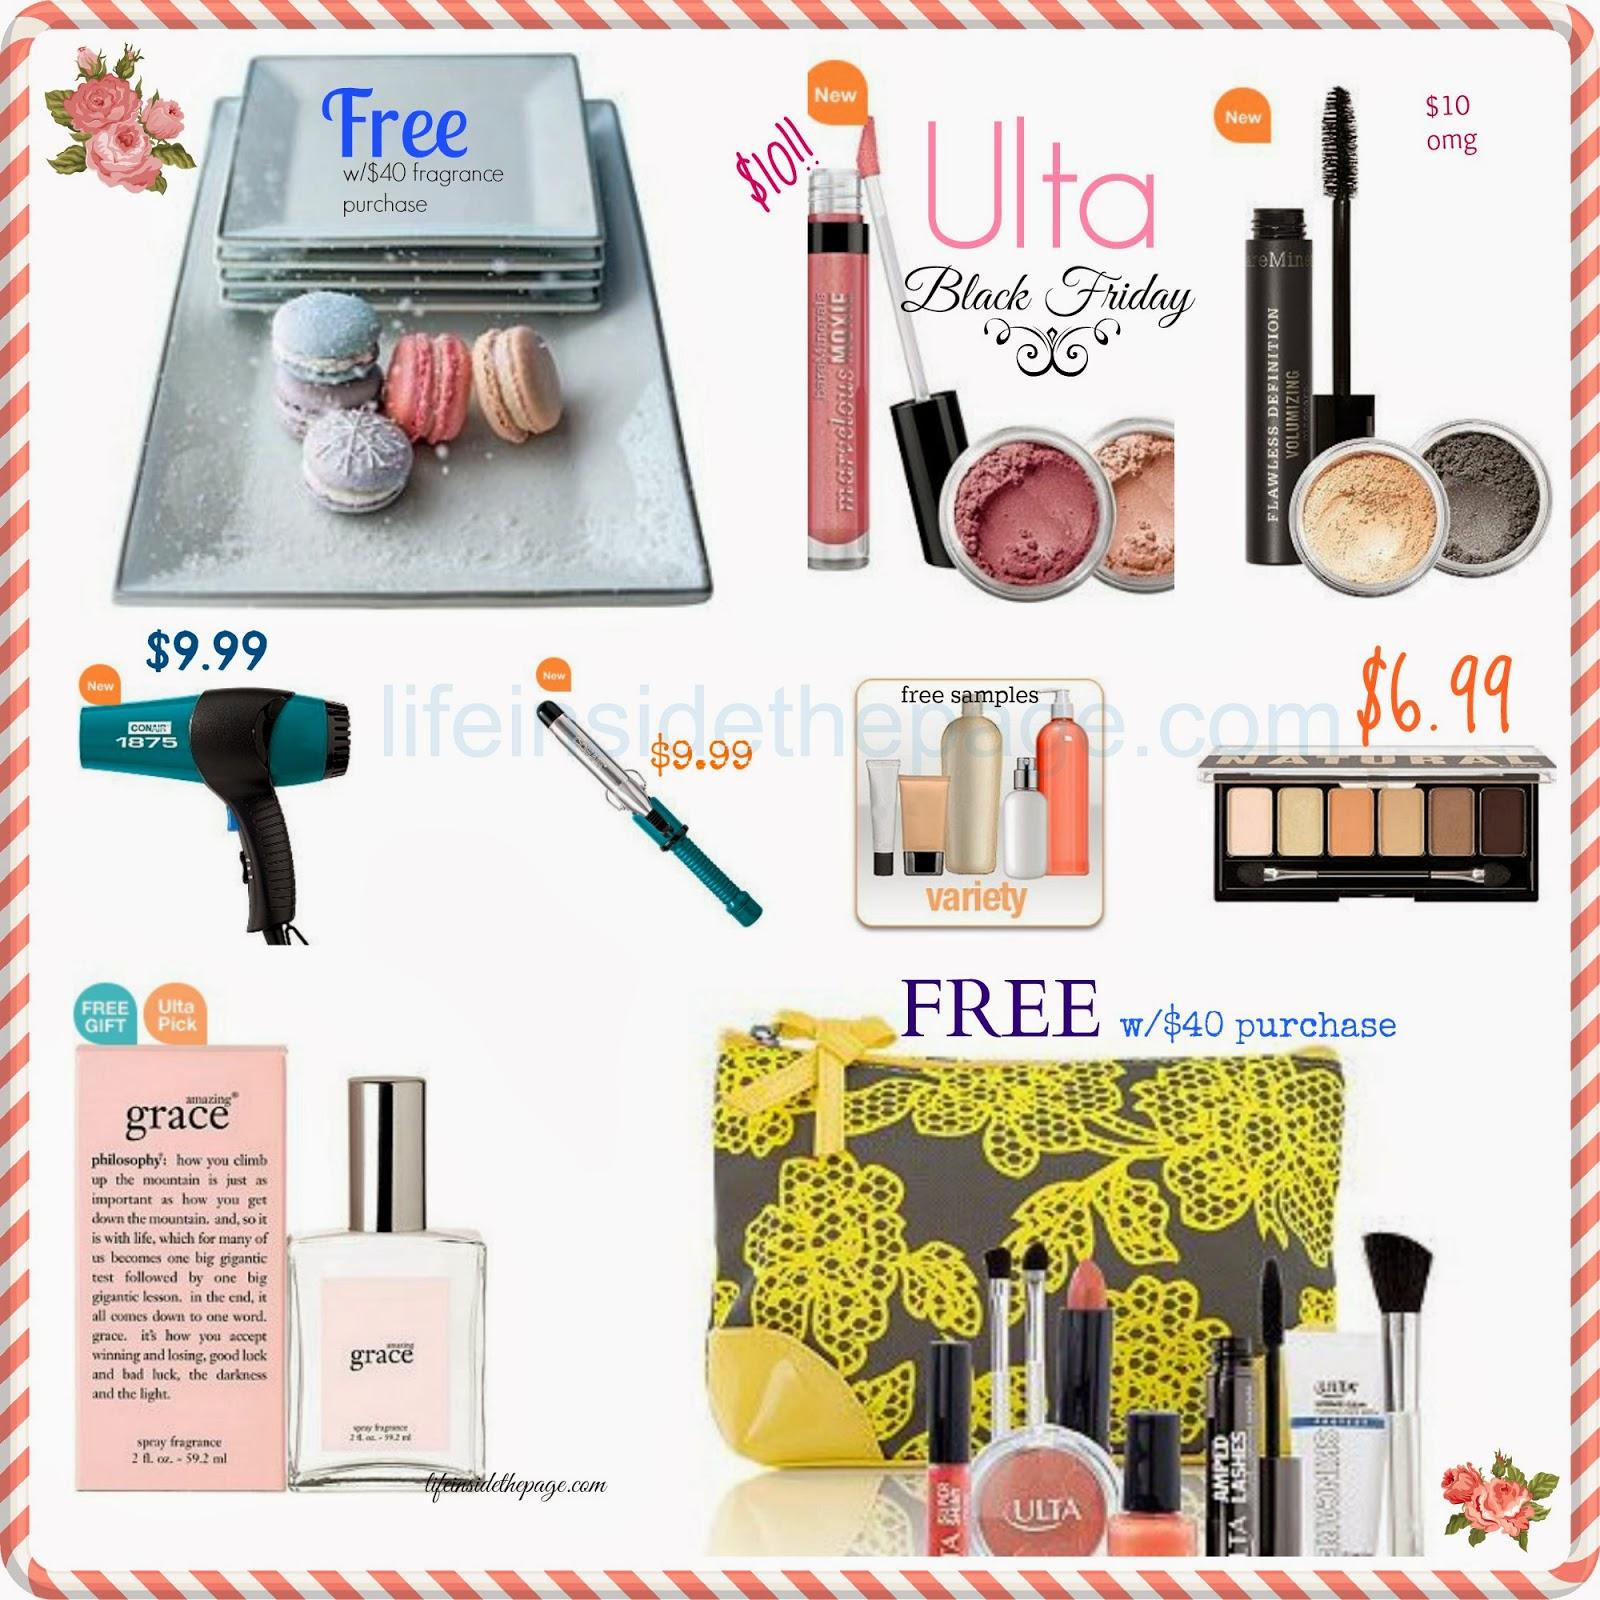 Free rimmel london lip gloss sample | shareyourfreebies.